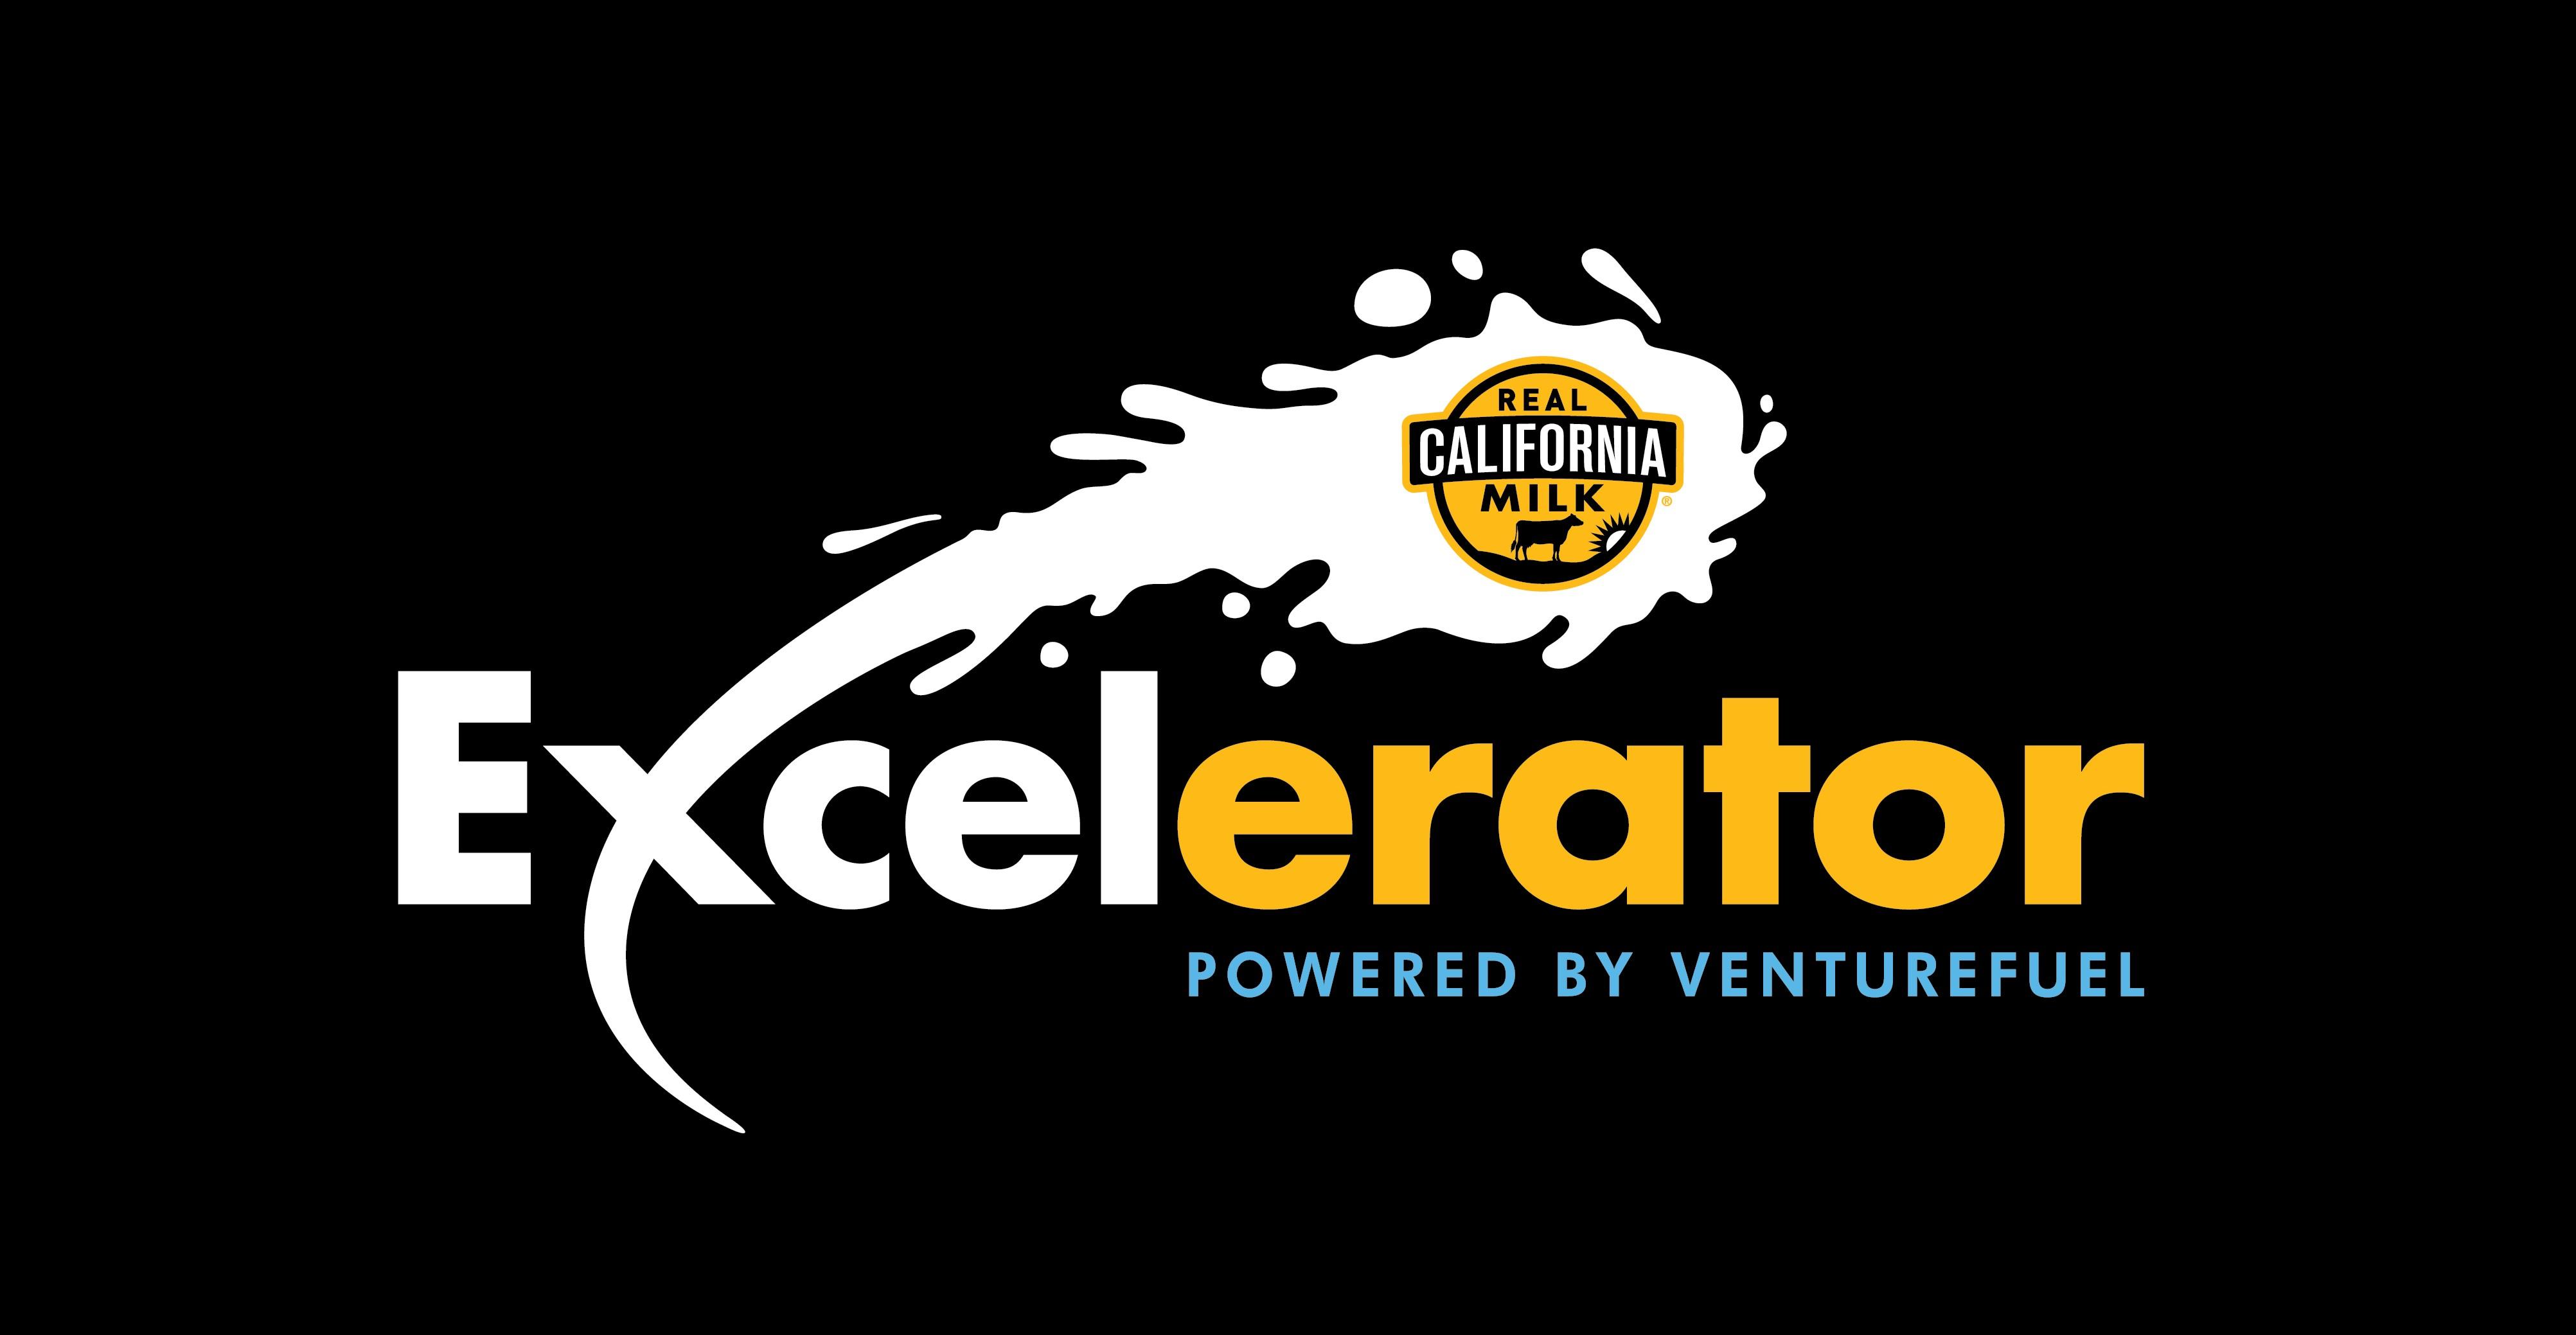 excelerator logo cropped